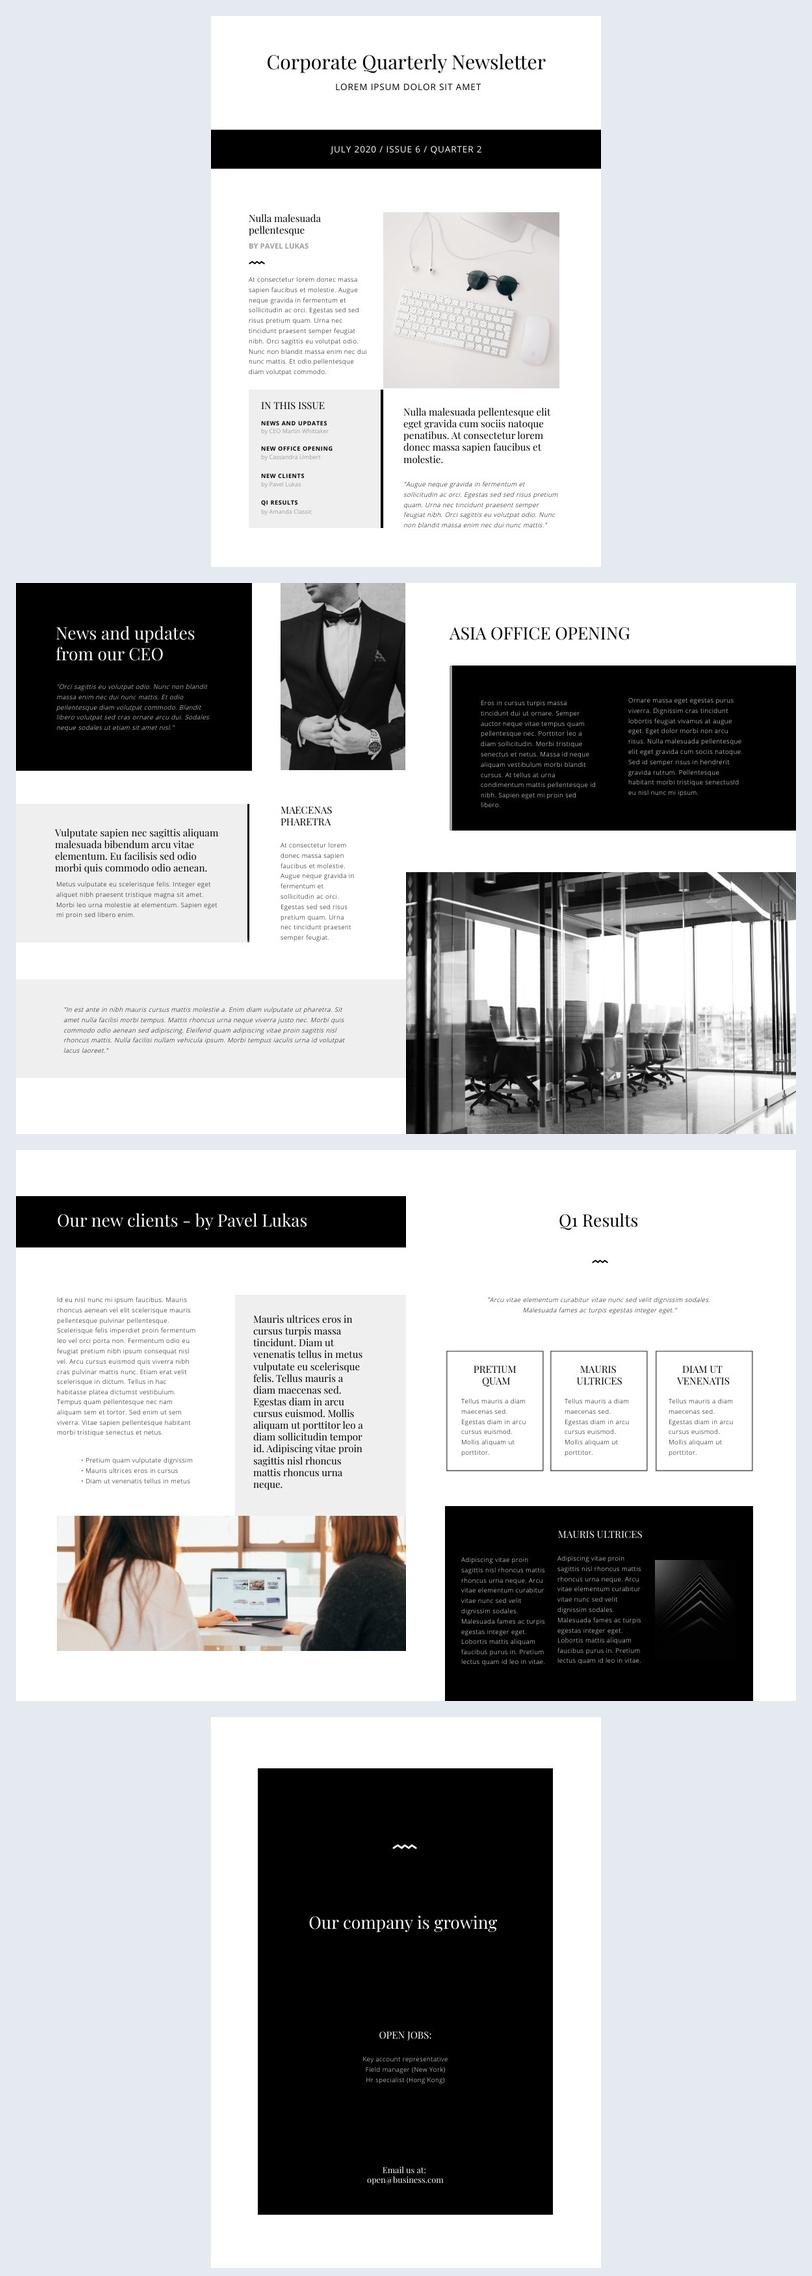 Online Corporate Newsletter Design Example